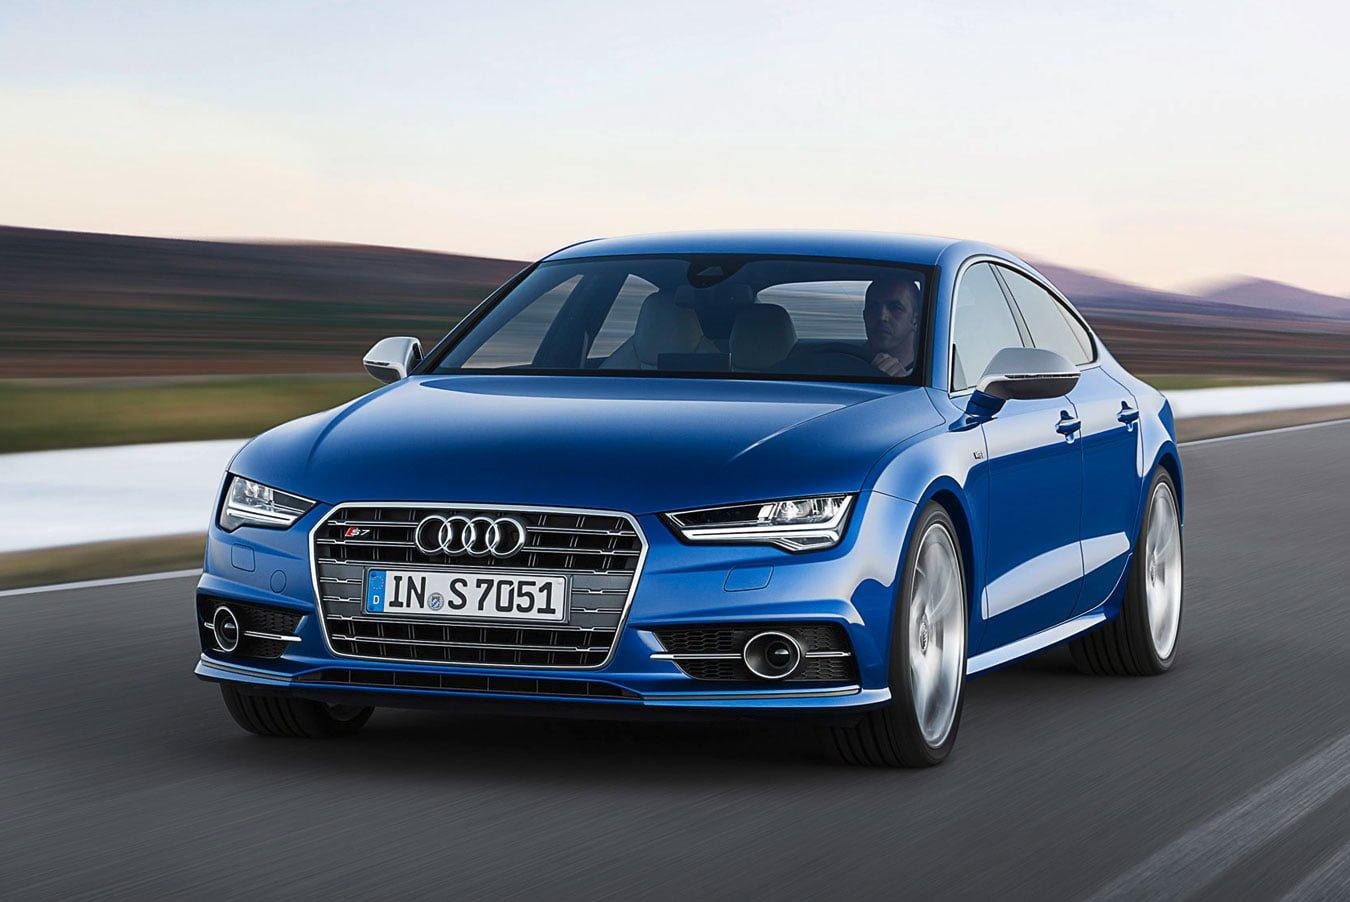 Audi S7 C7.0 (2011-2015)